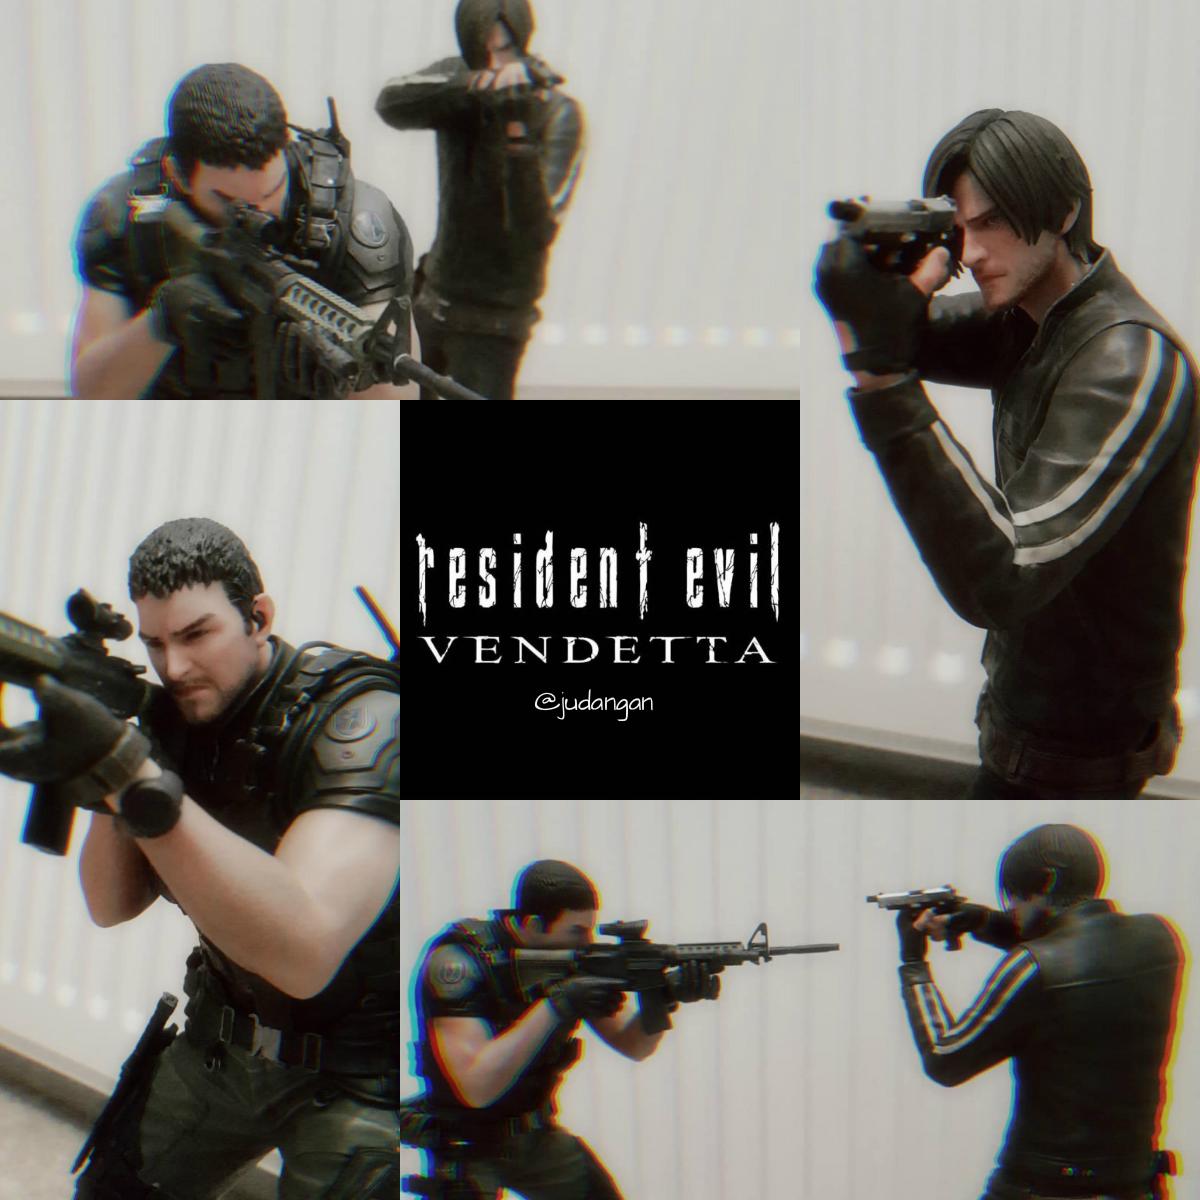 Resident Evil Vendetta Leon And Chris Figures By Ju Dan Gan On